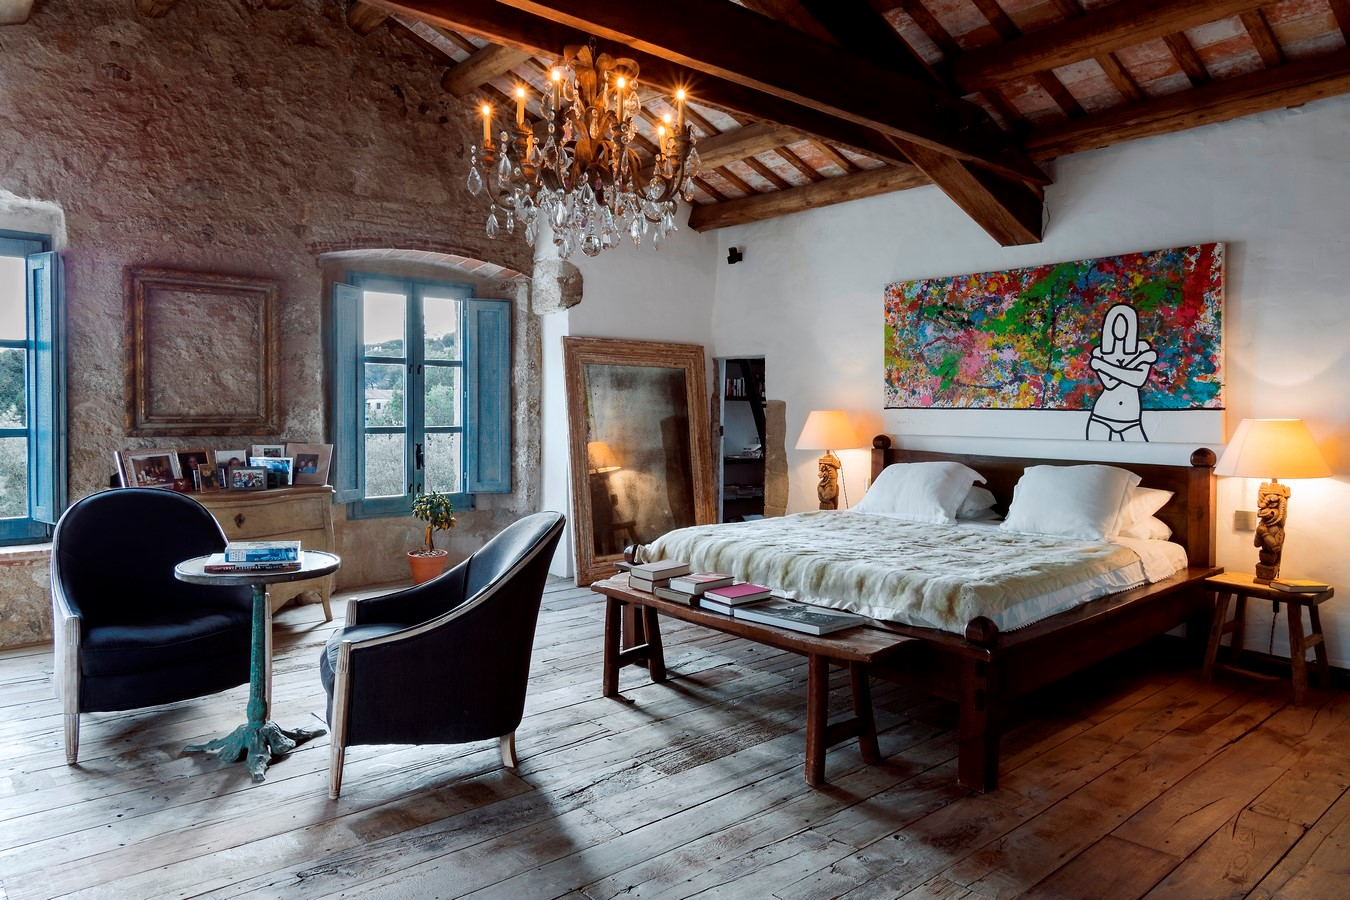 Catalan Farmhouse by Ana Engelhorn Interior Design Ltd - Sheet1